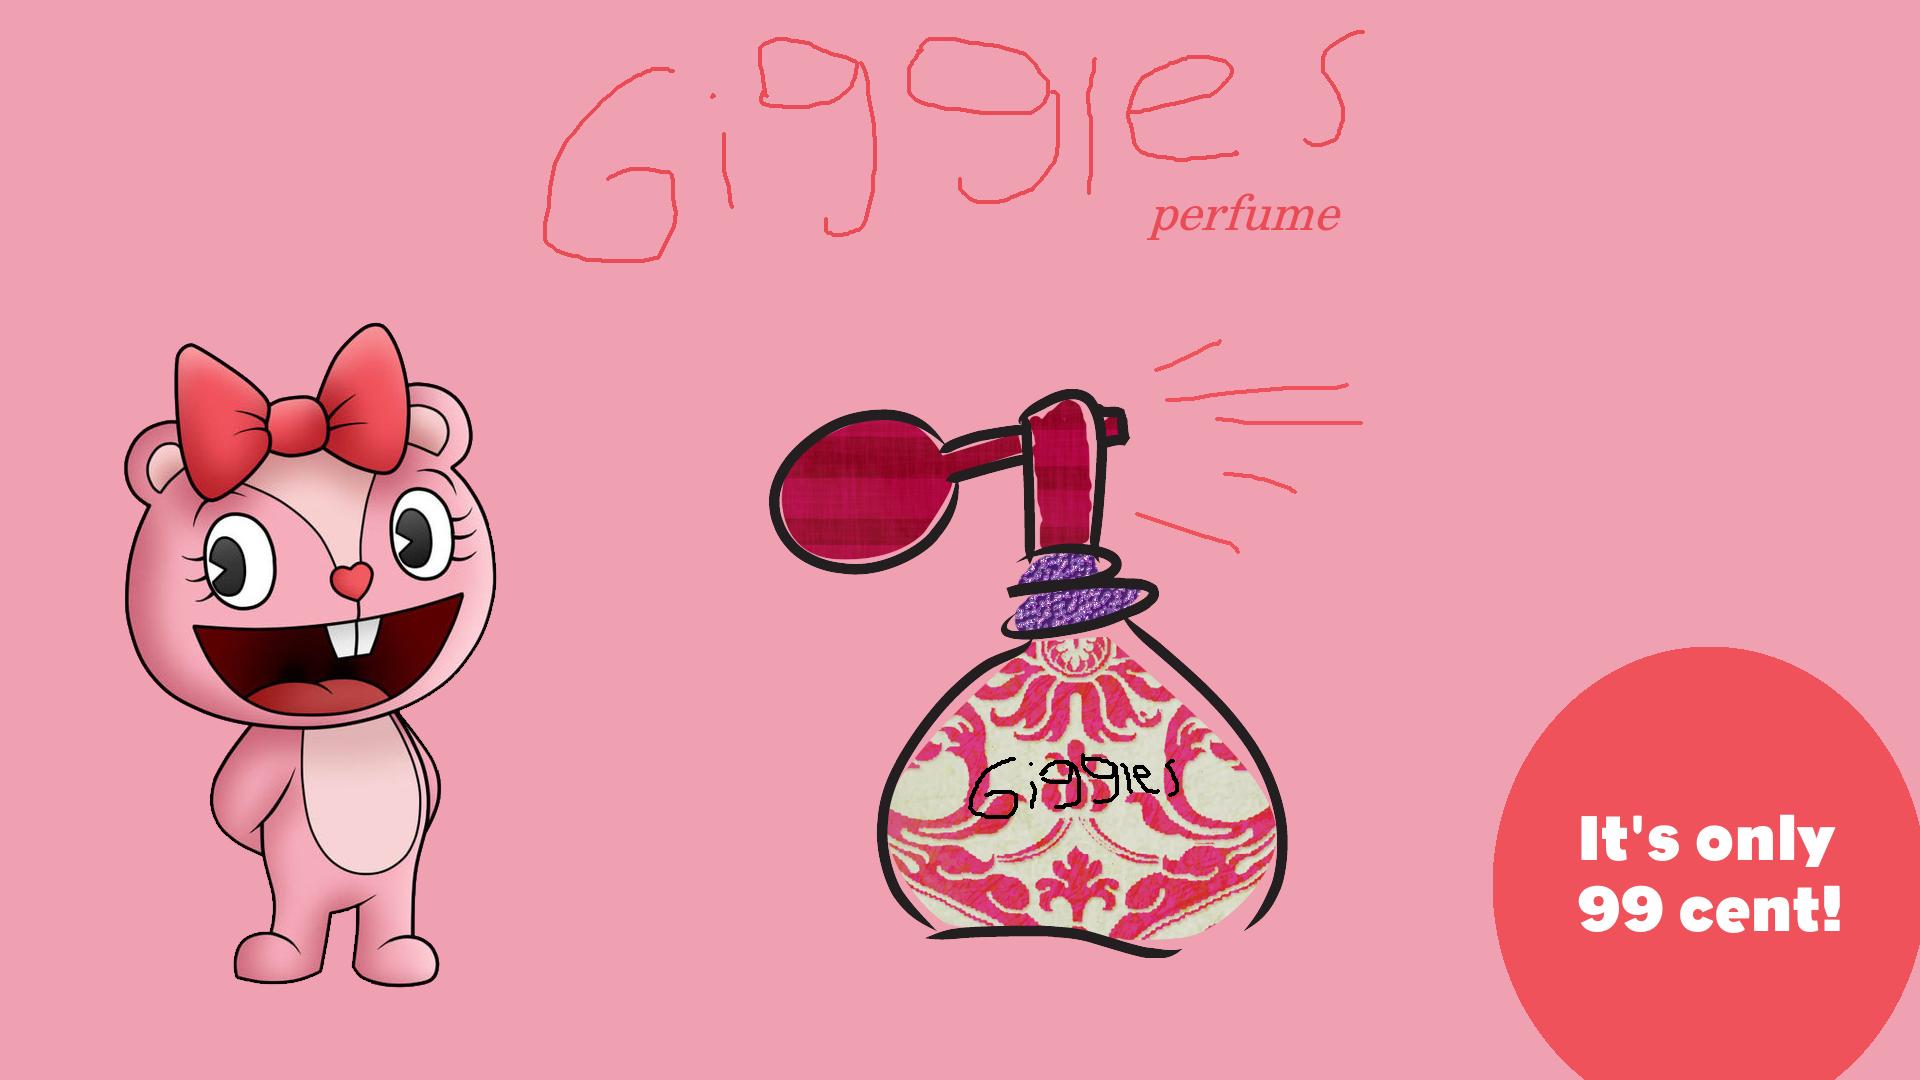 Giggles perfume.png